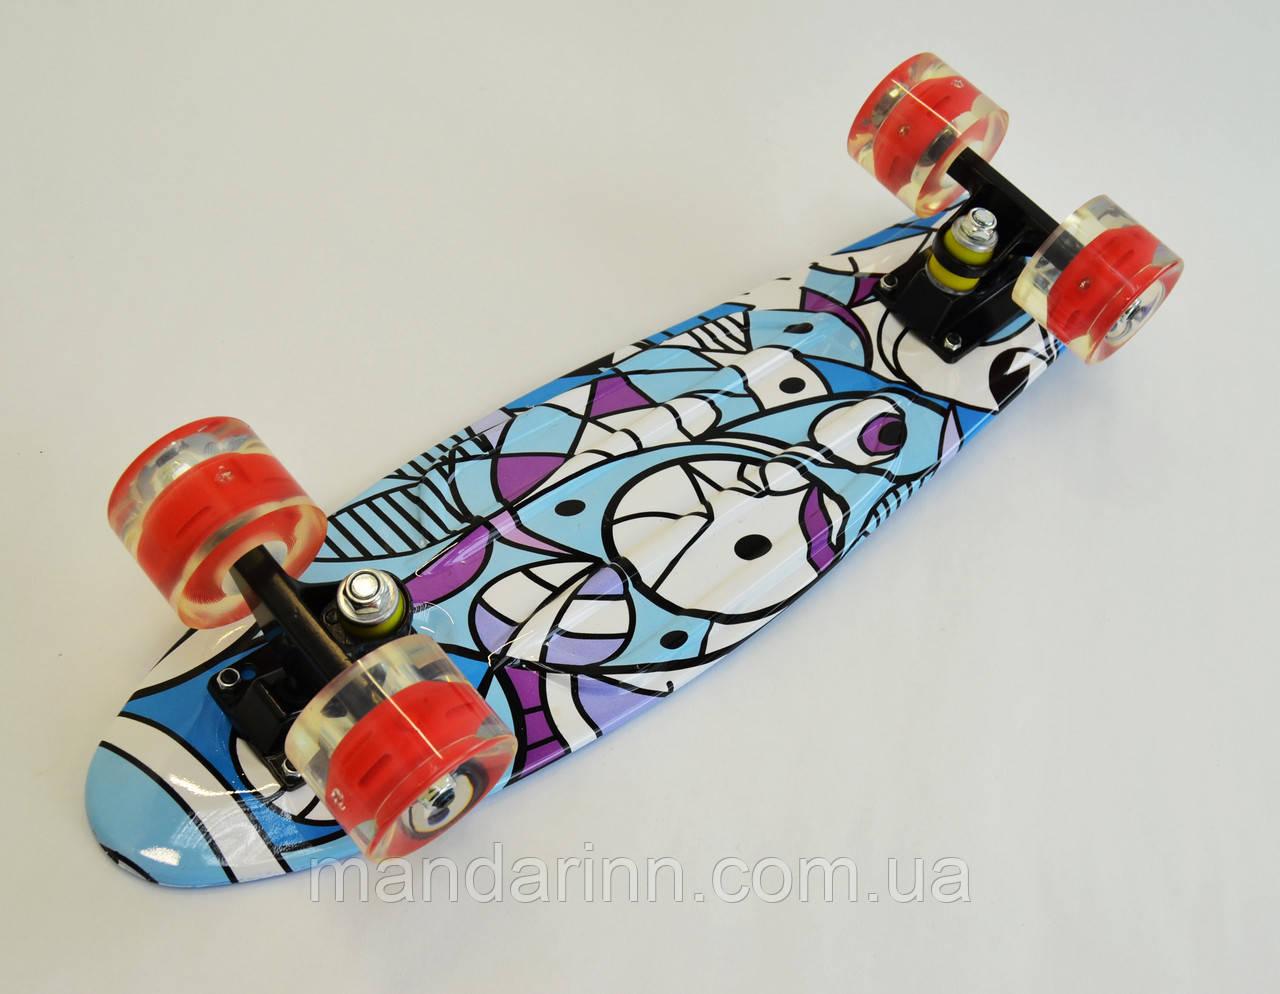 Скейтборд, Скейт Penny MARCOS Голубой Колеса-LED (2-х цветной )